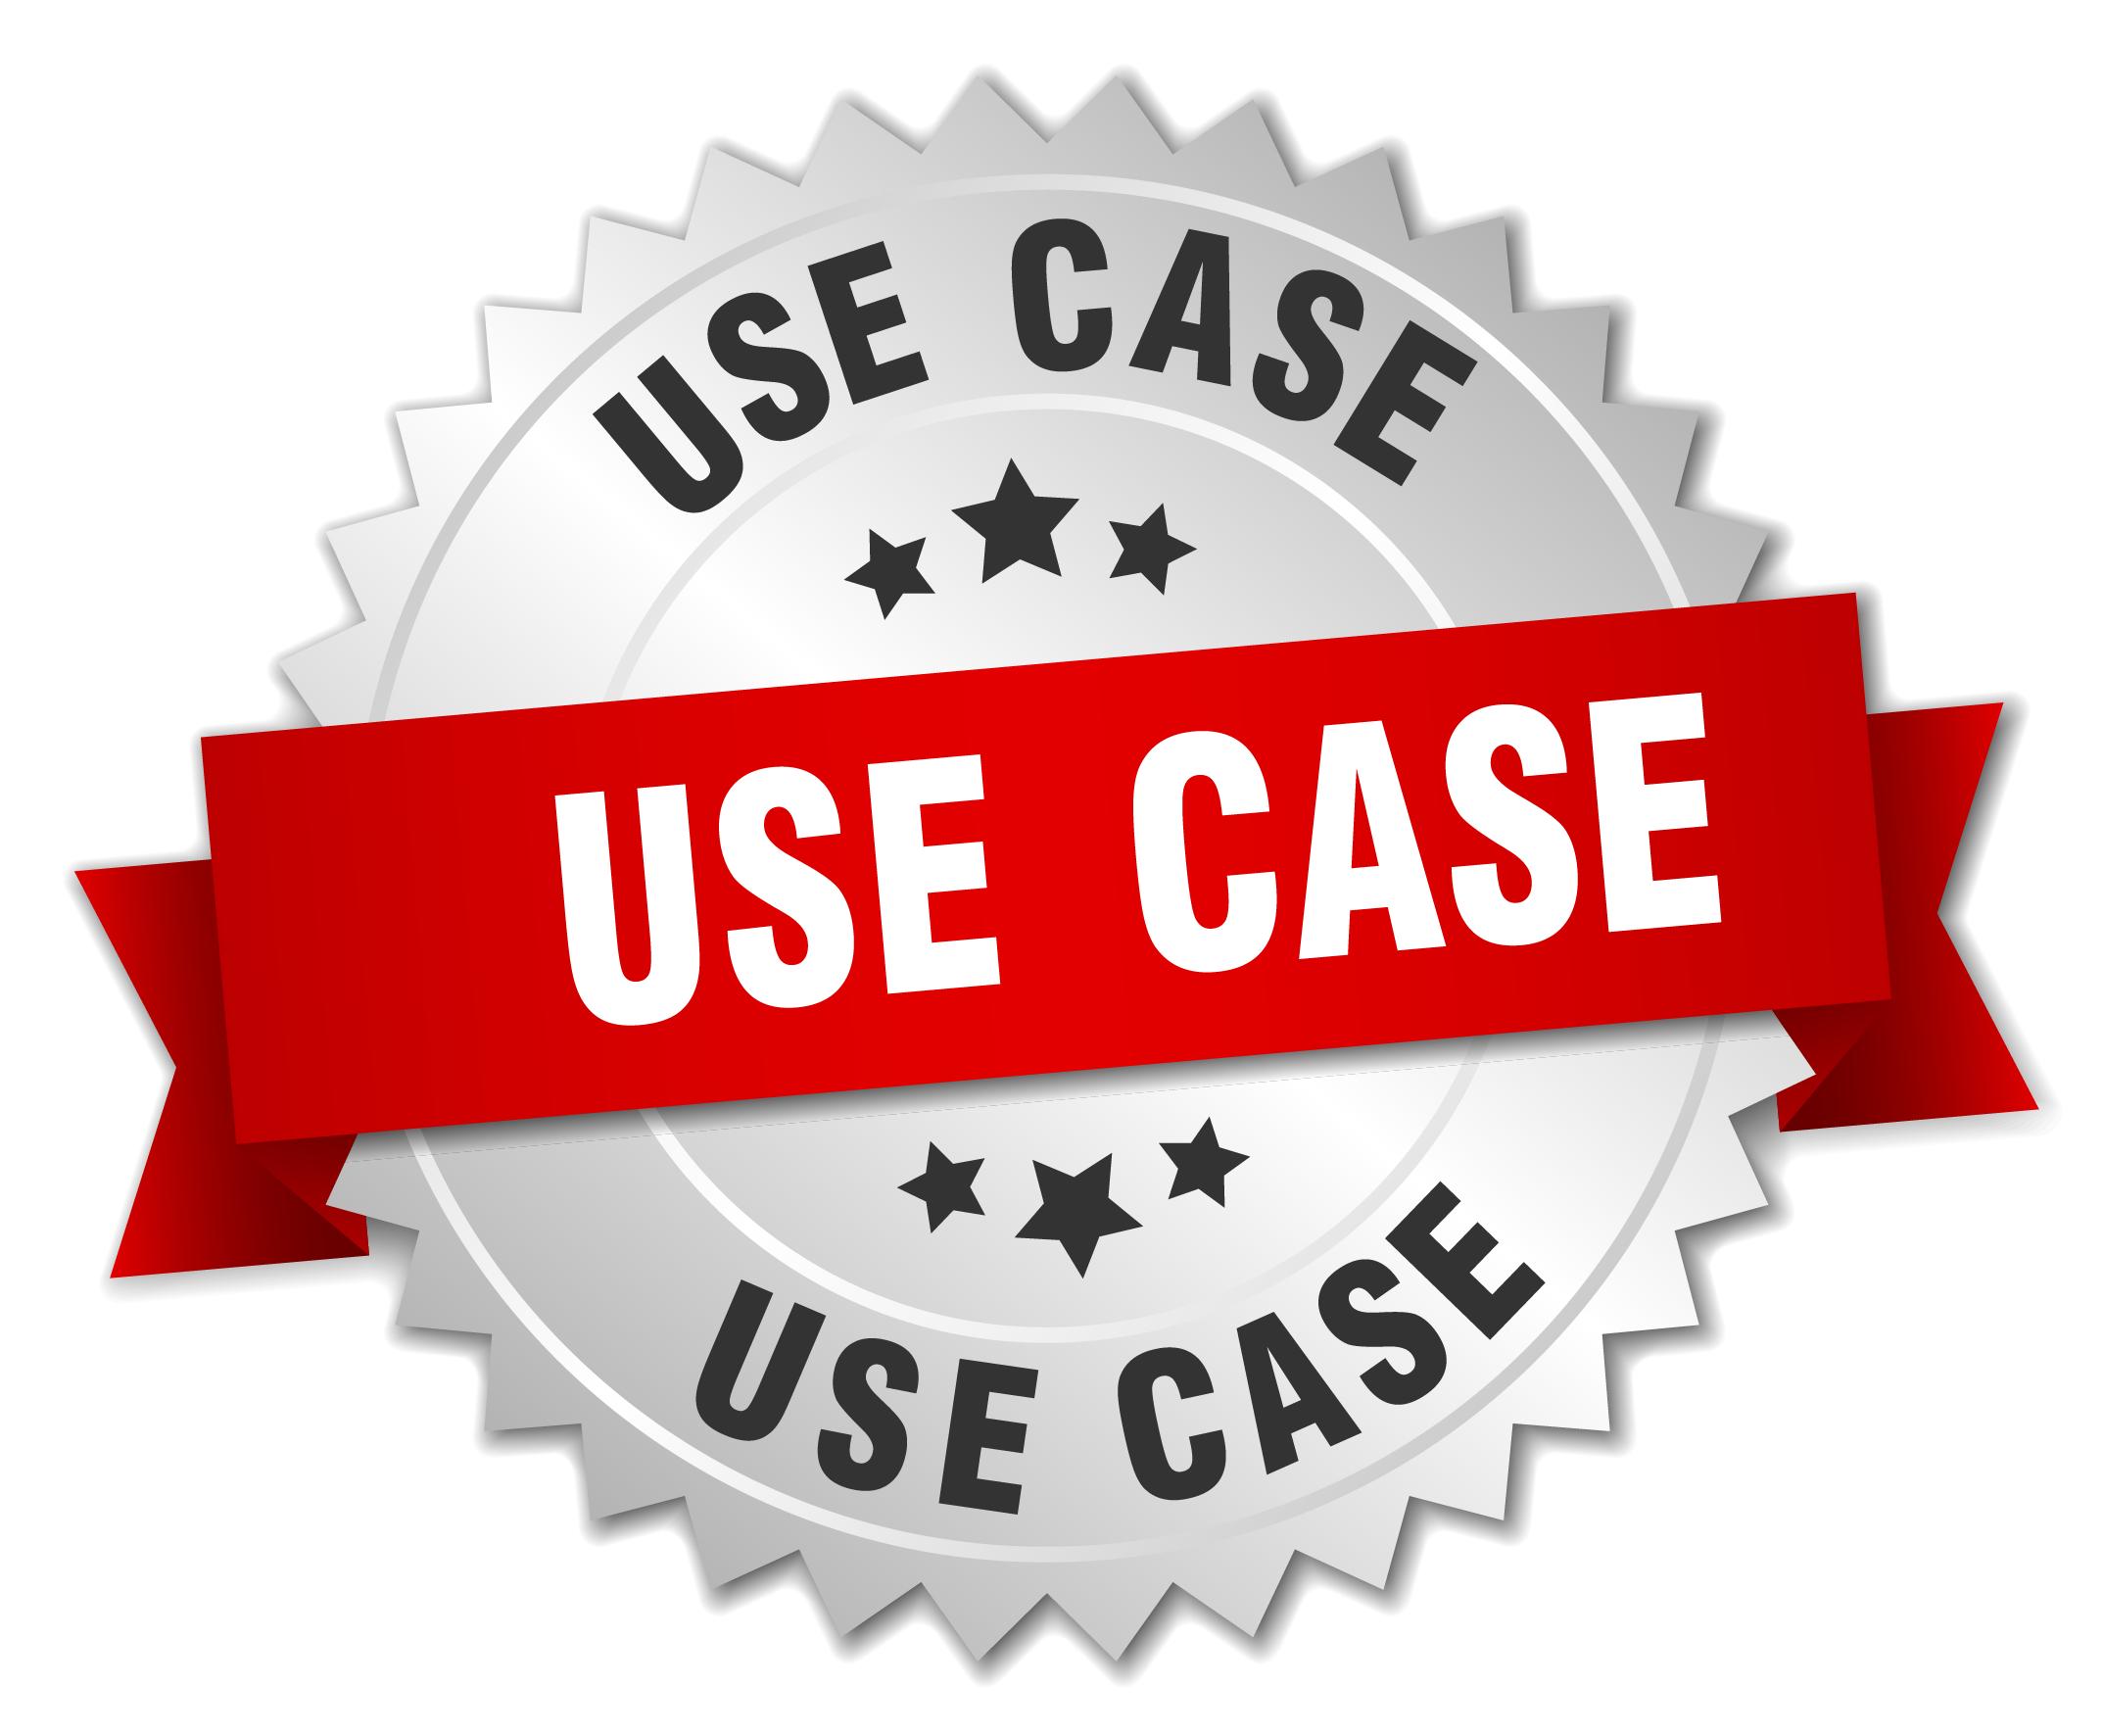 Use Case icon